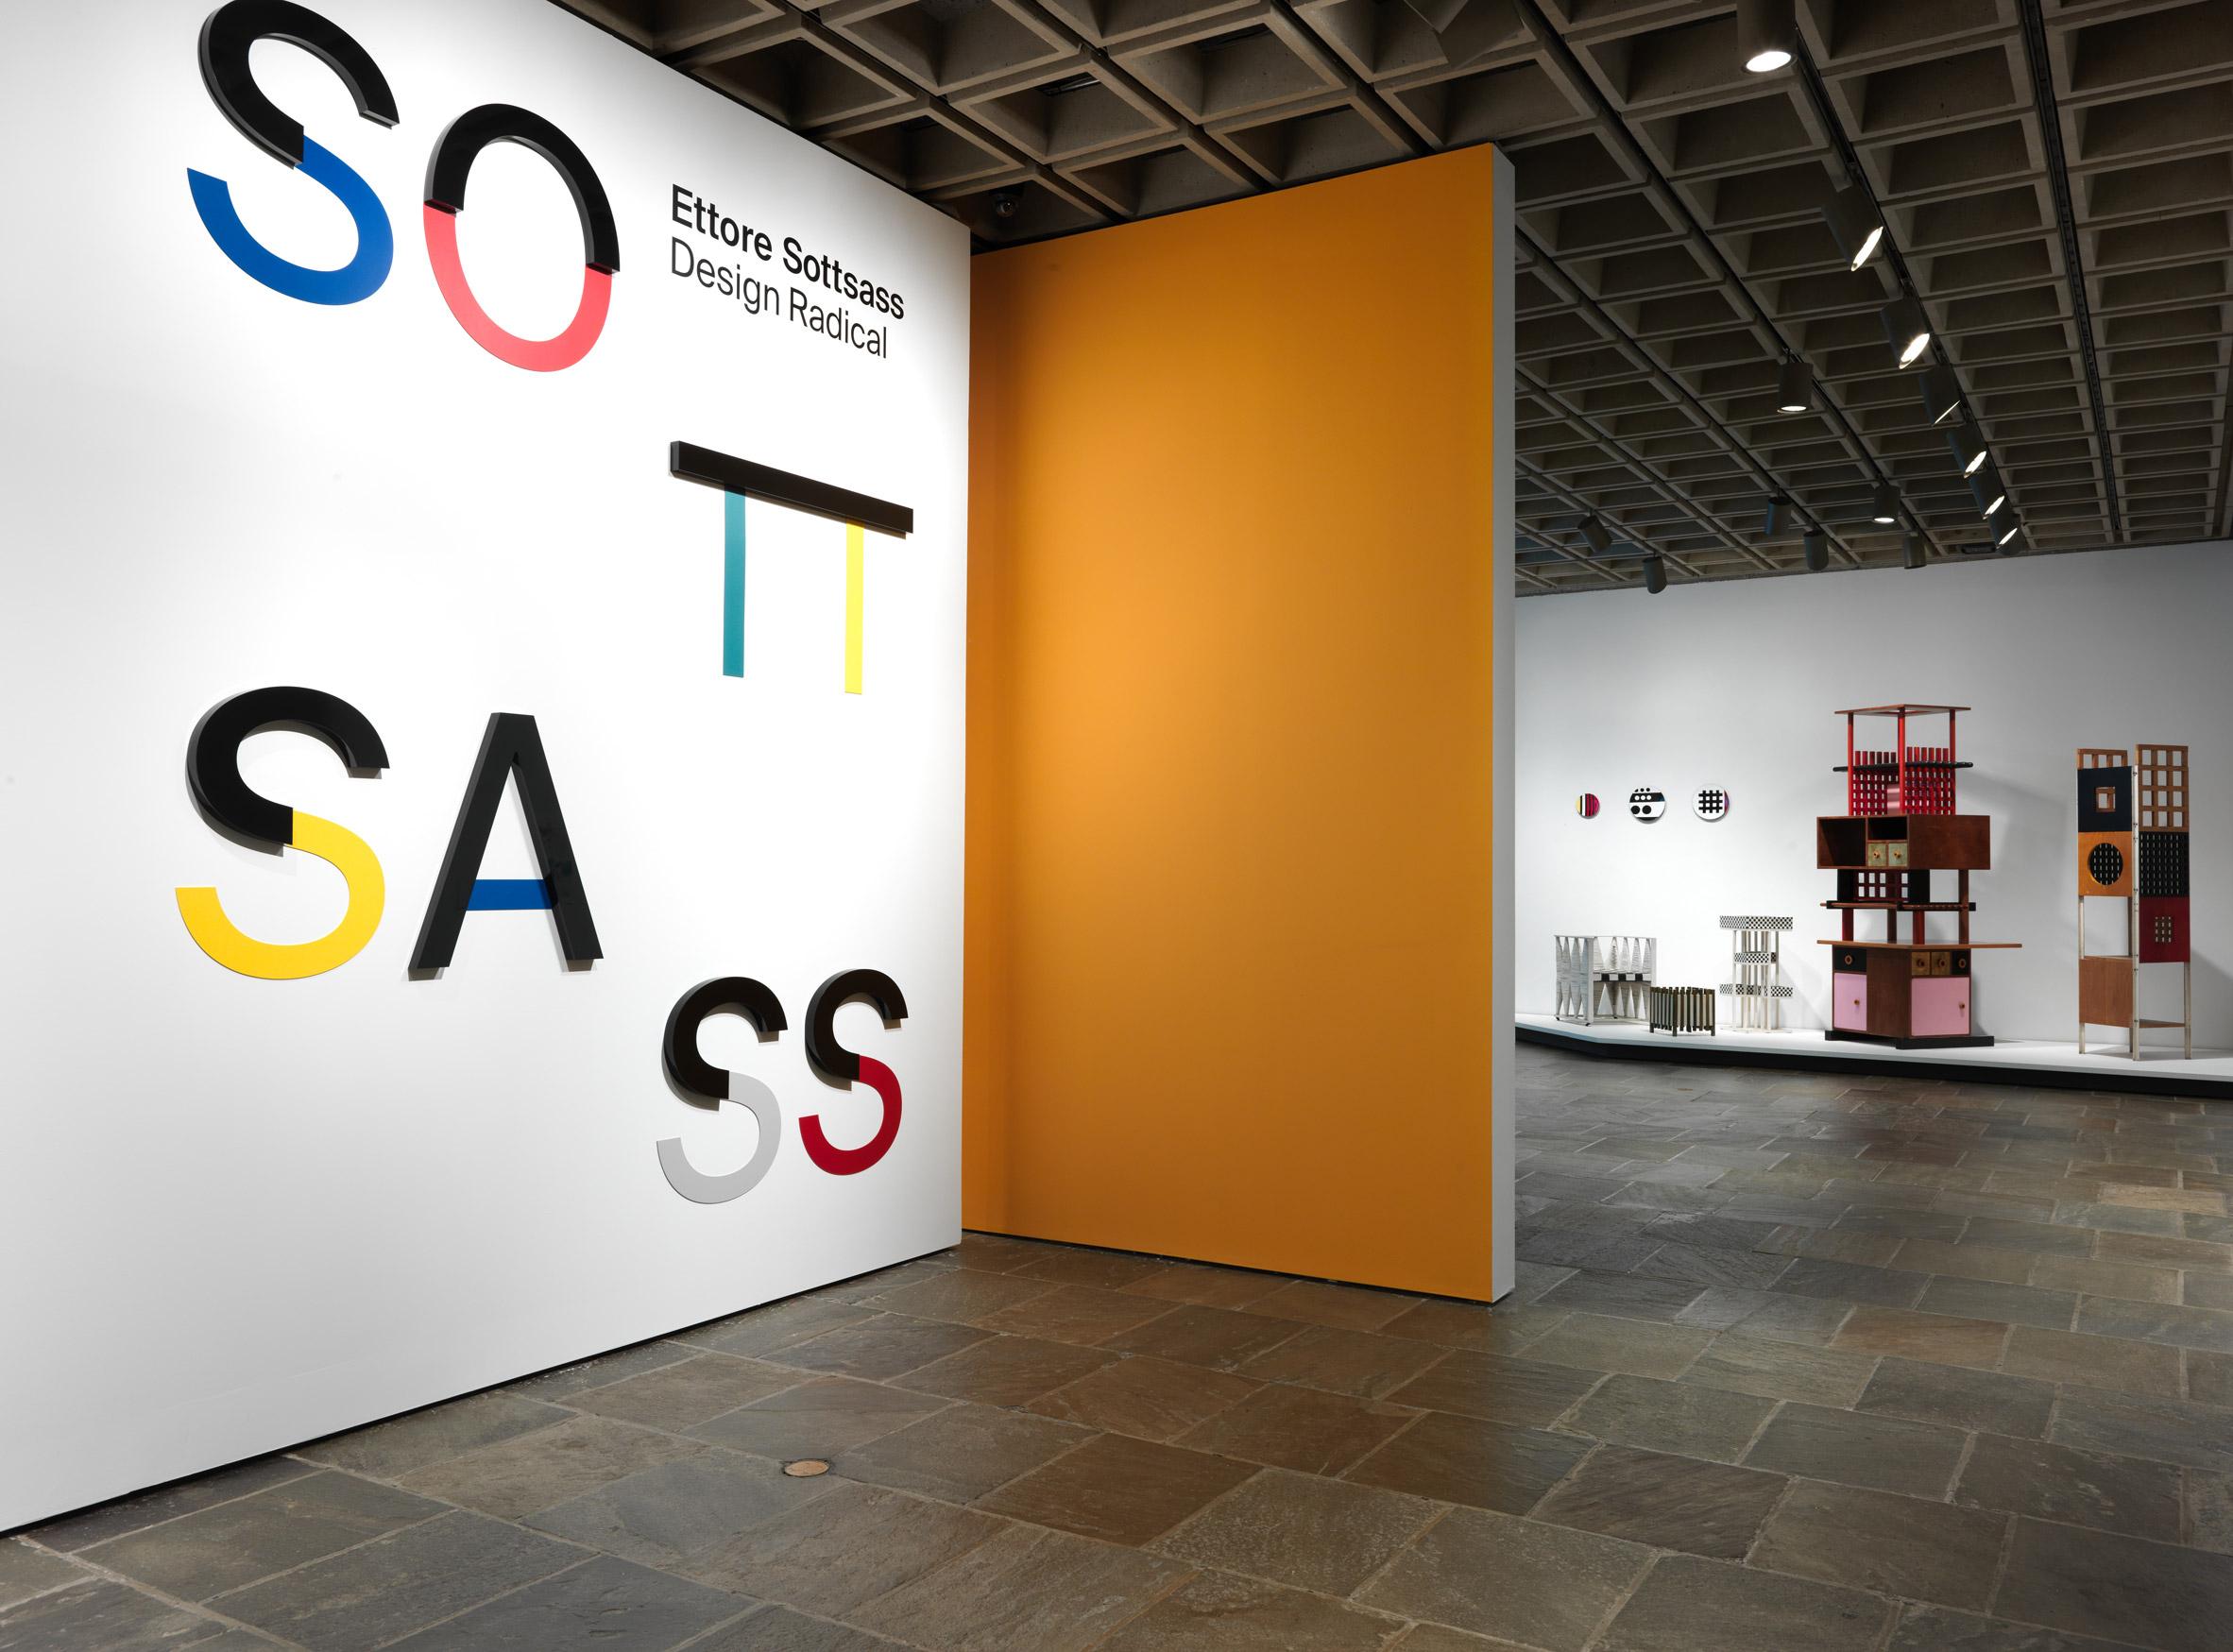 Met Breuer exhibition contextualises Ettore Sottsass' colourful designs